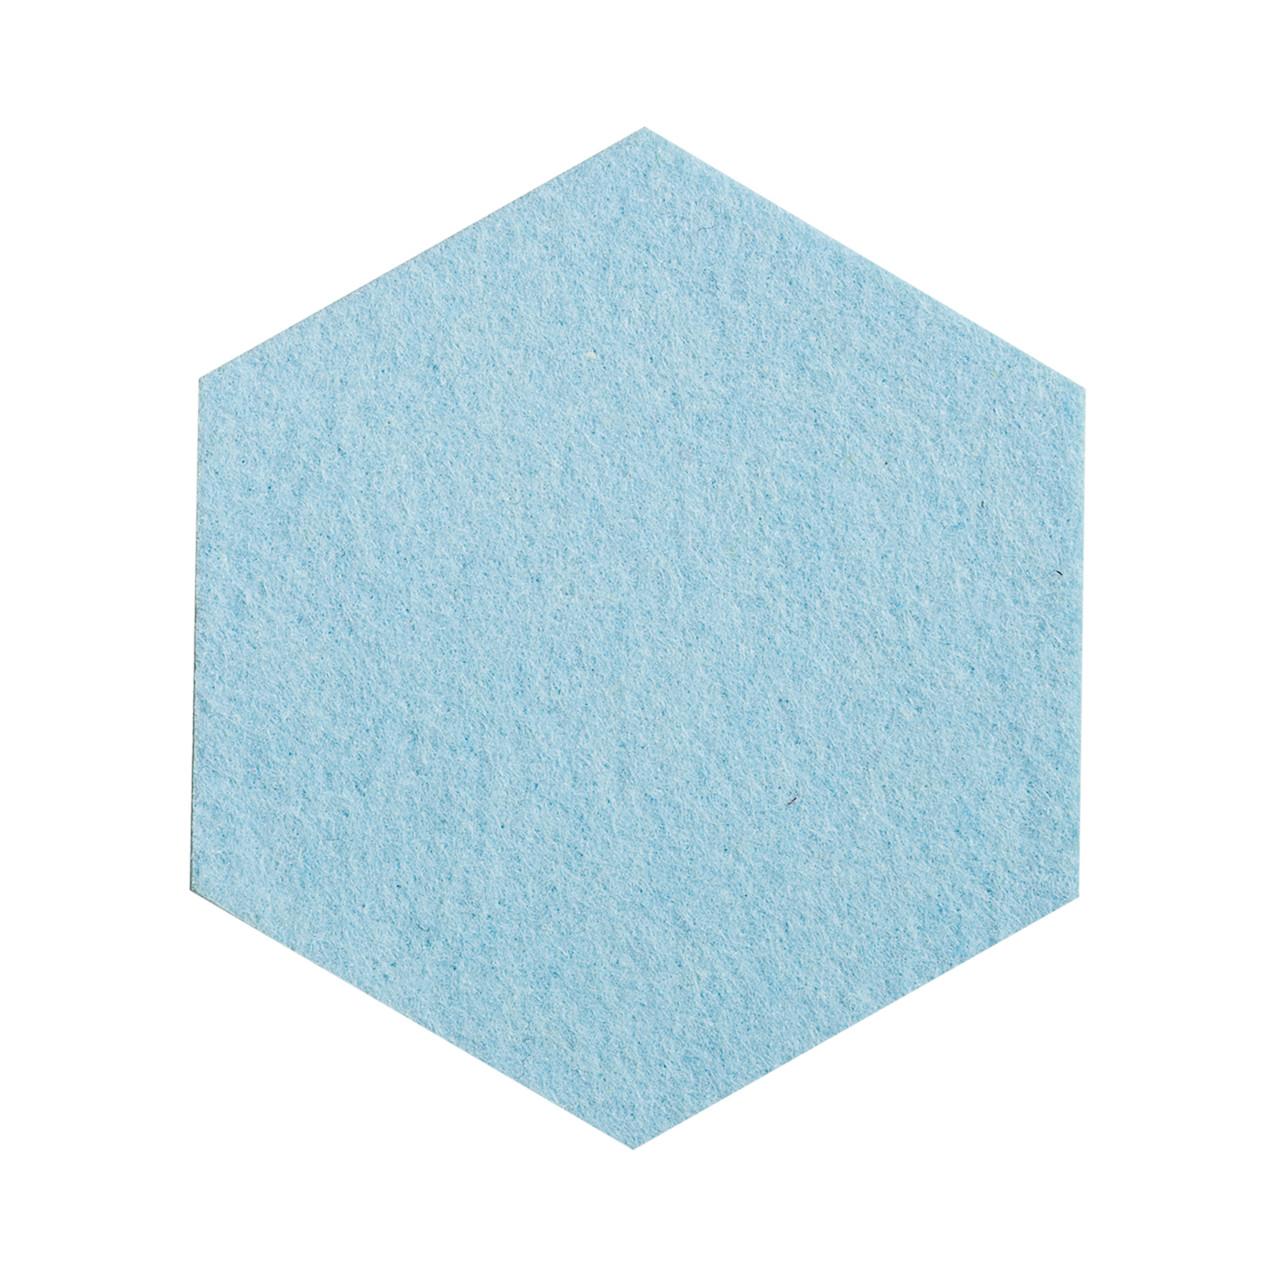 Cr ton maison filtcoasters sekskantetede 6 stk 10 cm for Creton maison